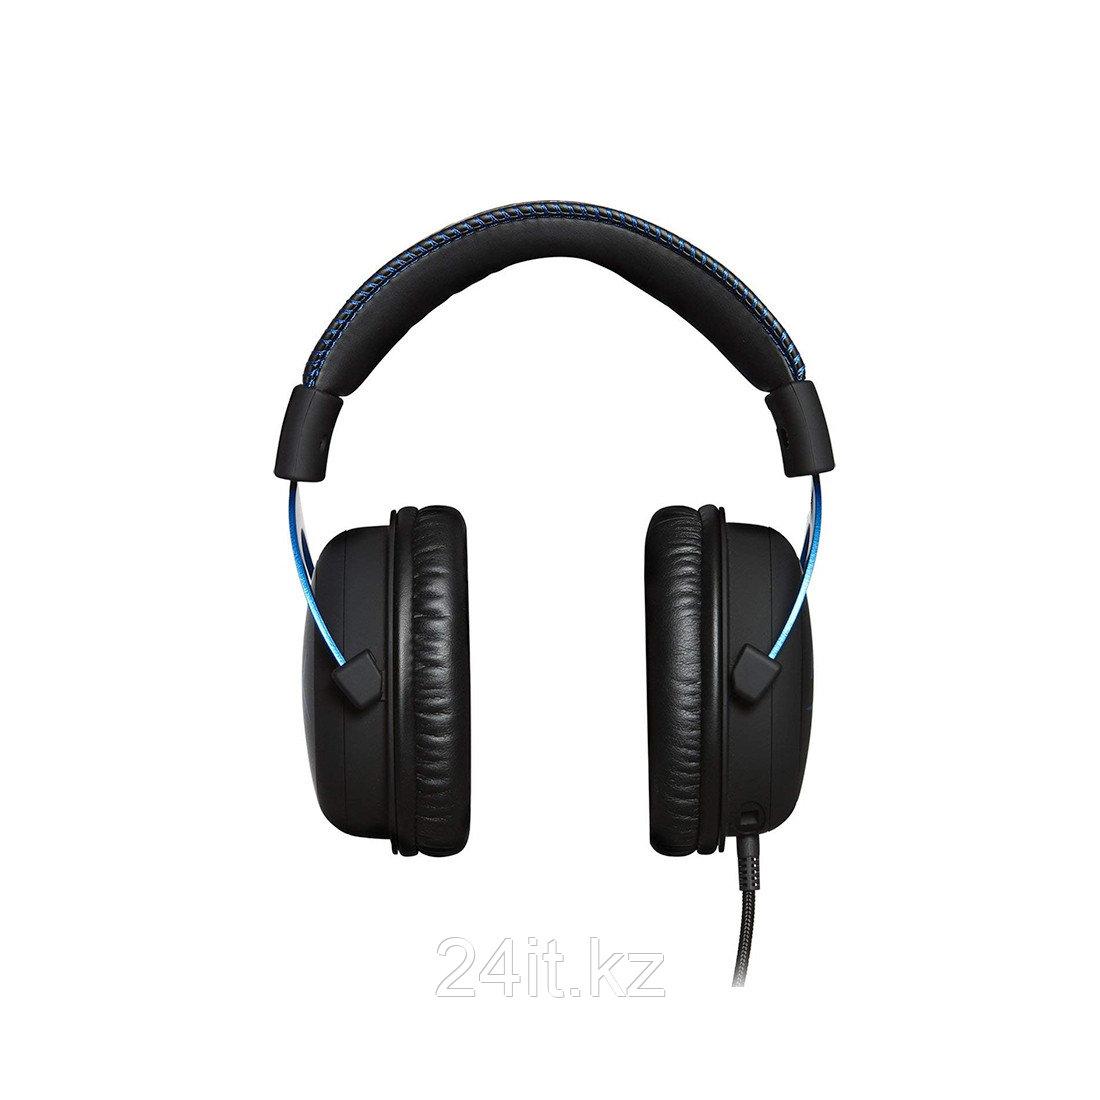 Гарнитура HyperX Cloud Gaming Headset - Blue for PS4 HX-HSCLS-BL/EM - фото 1